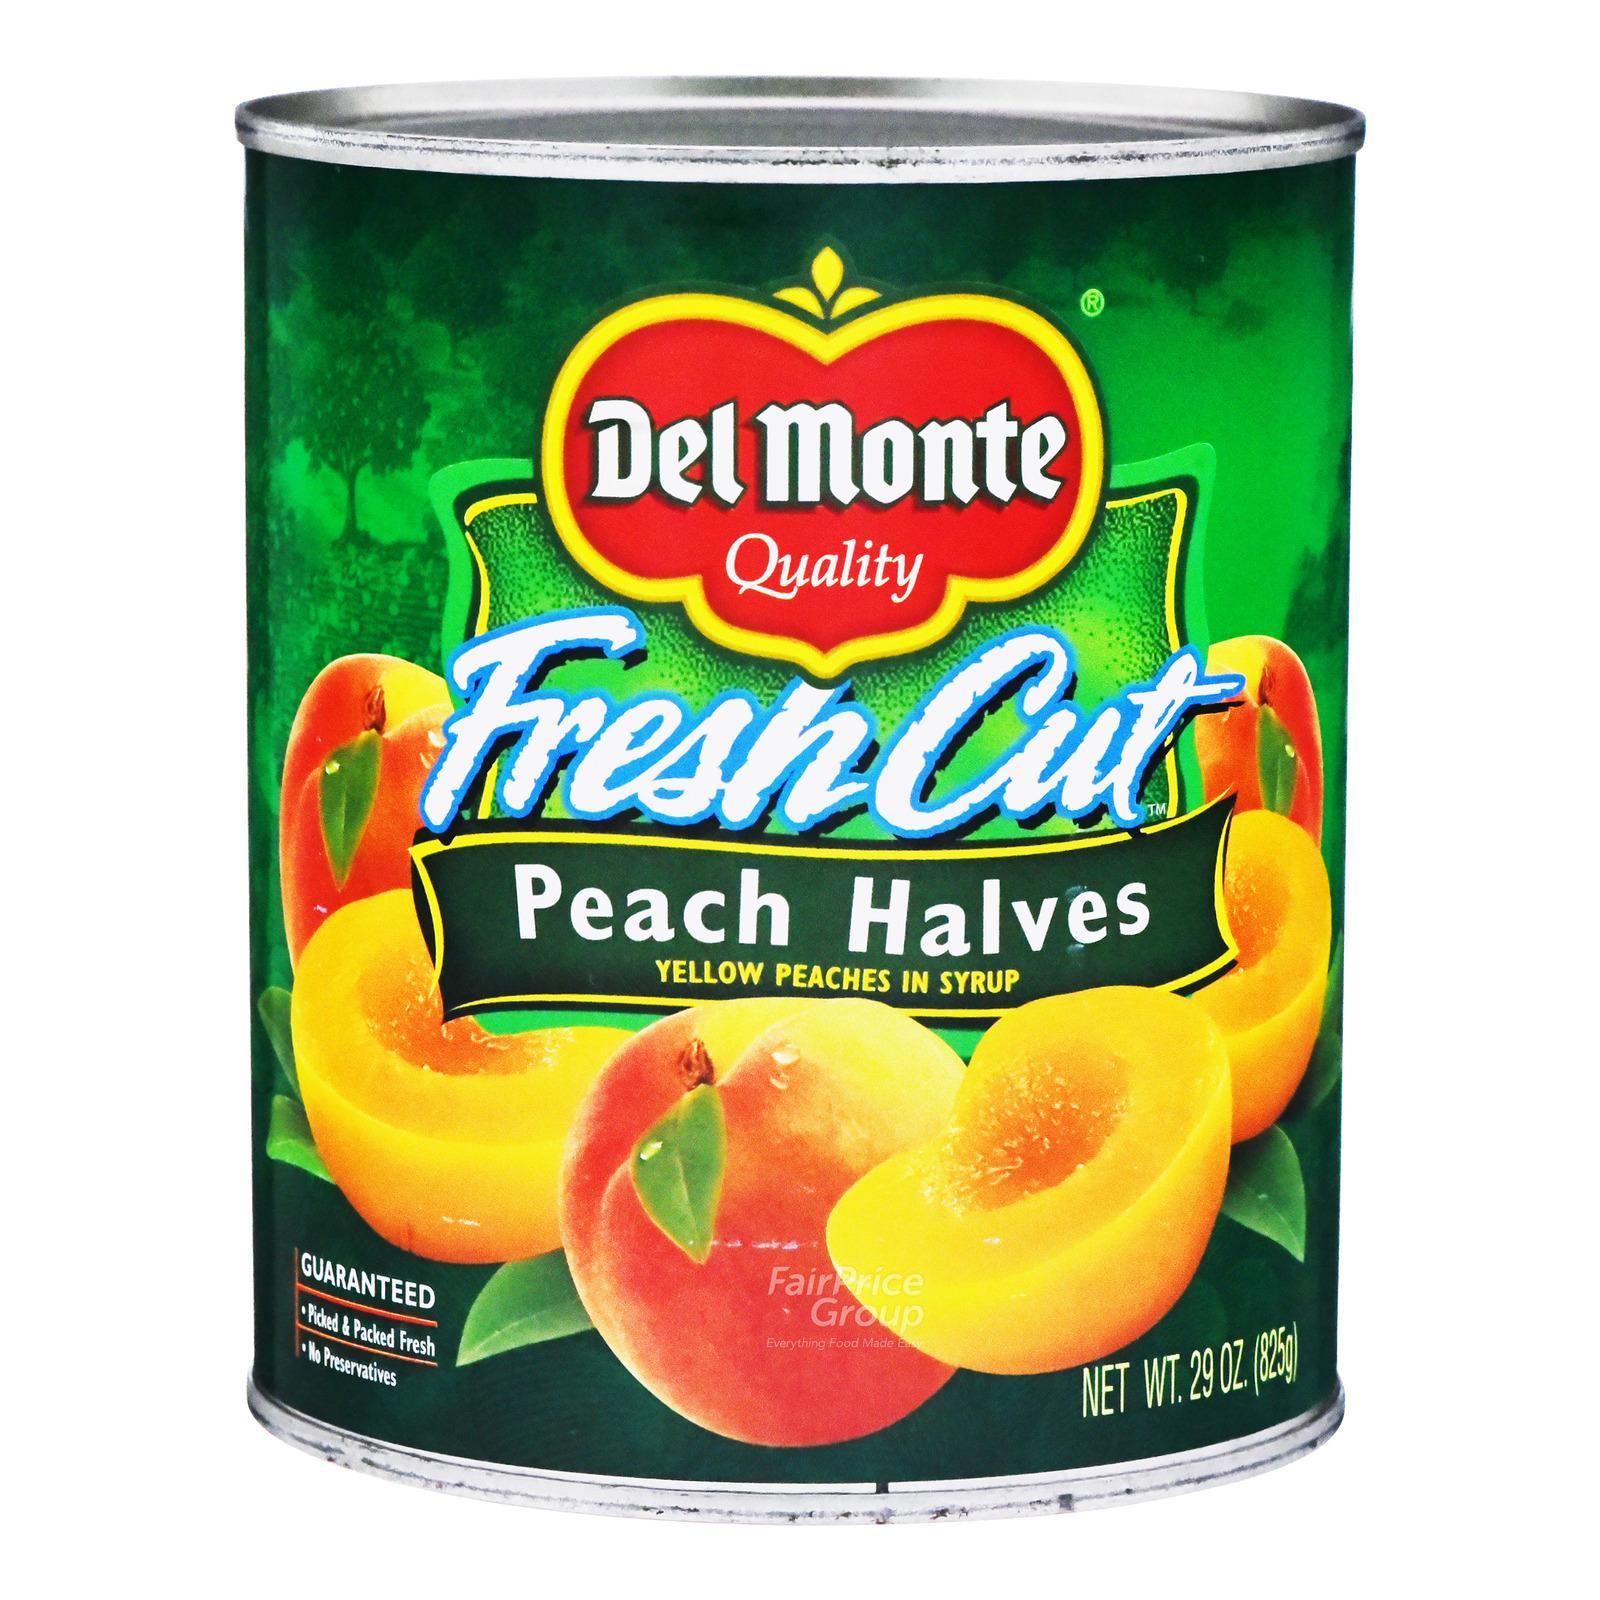 Del Monte Fresh Cut in Syrup - Peach Halves